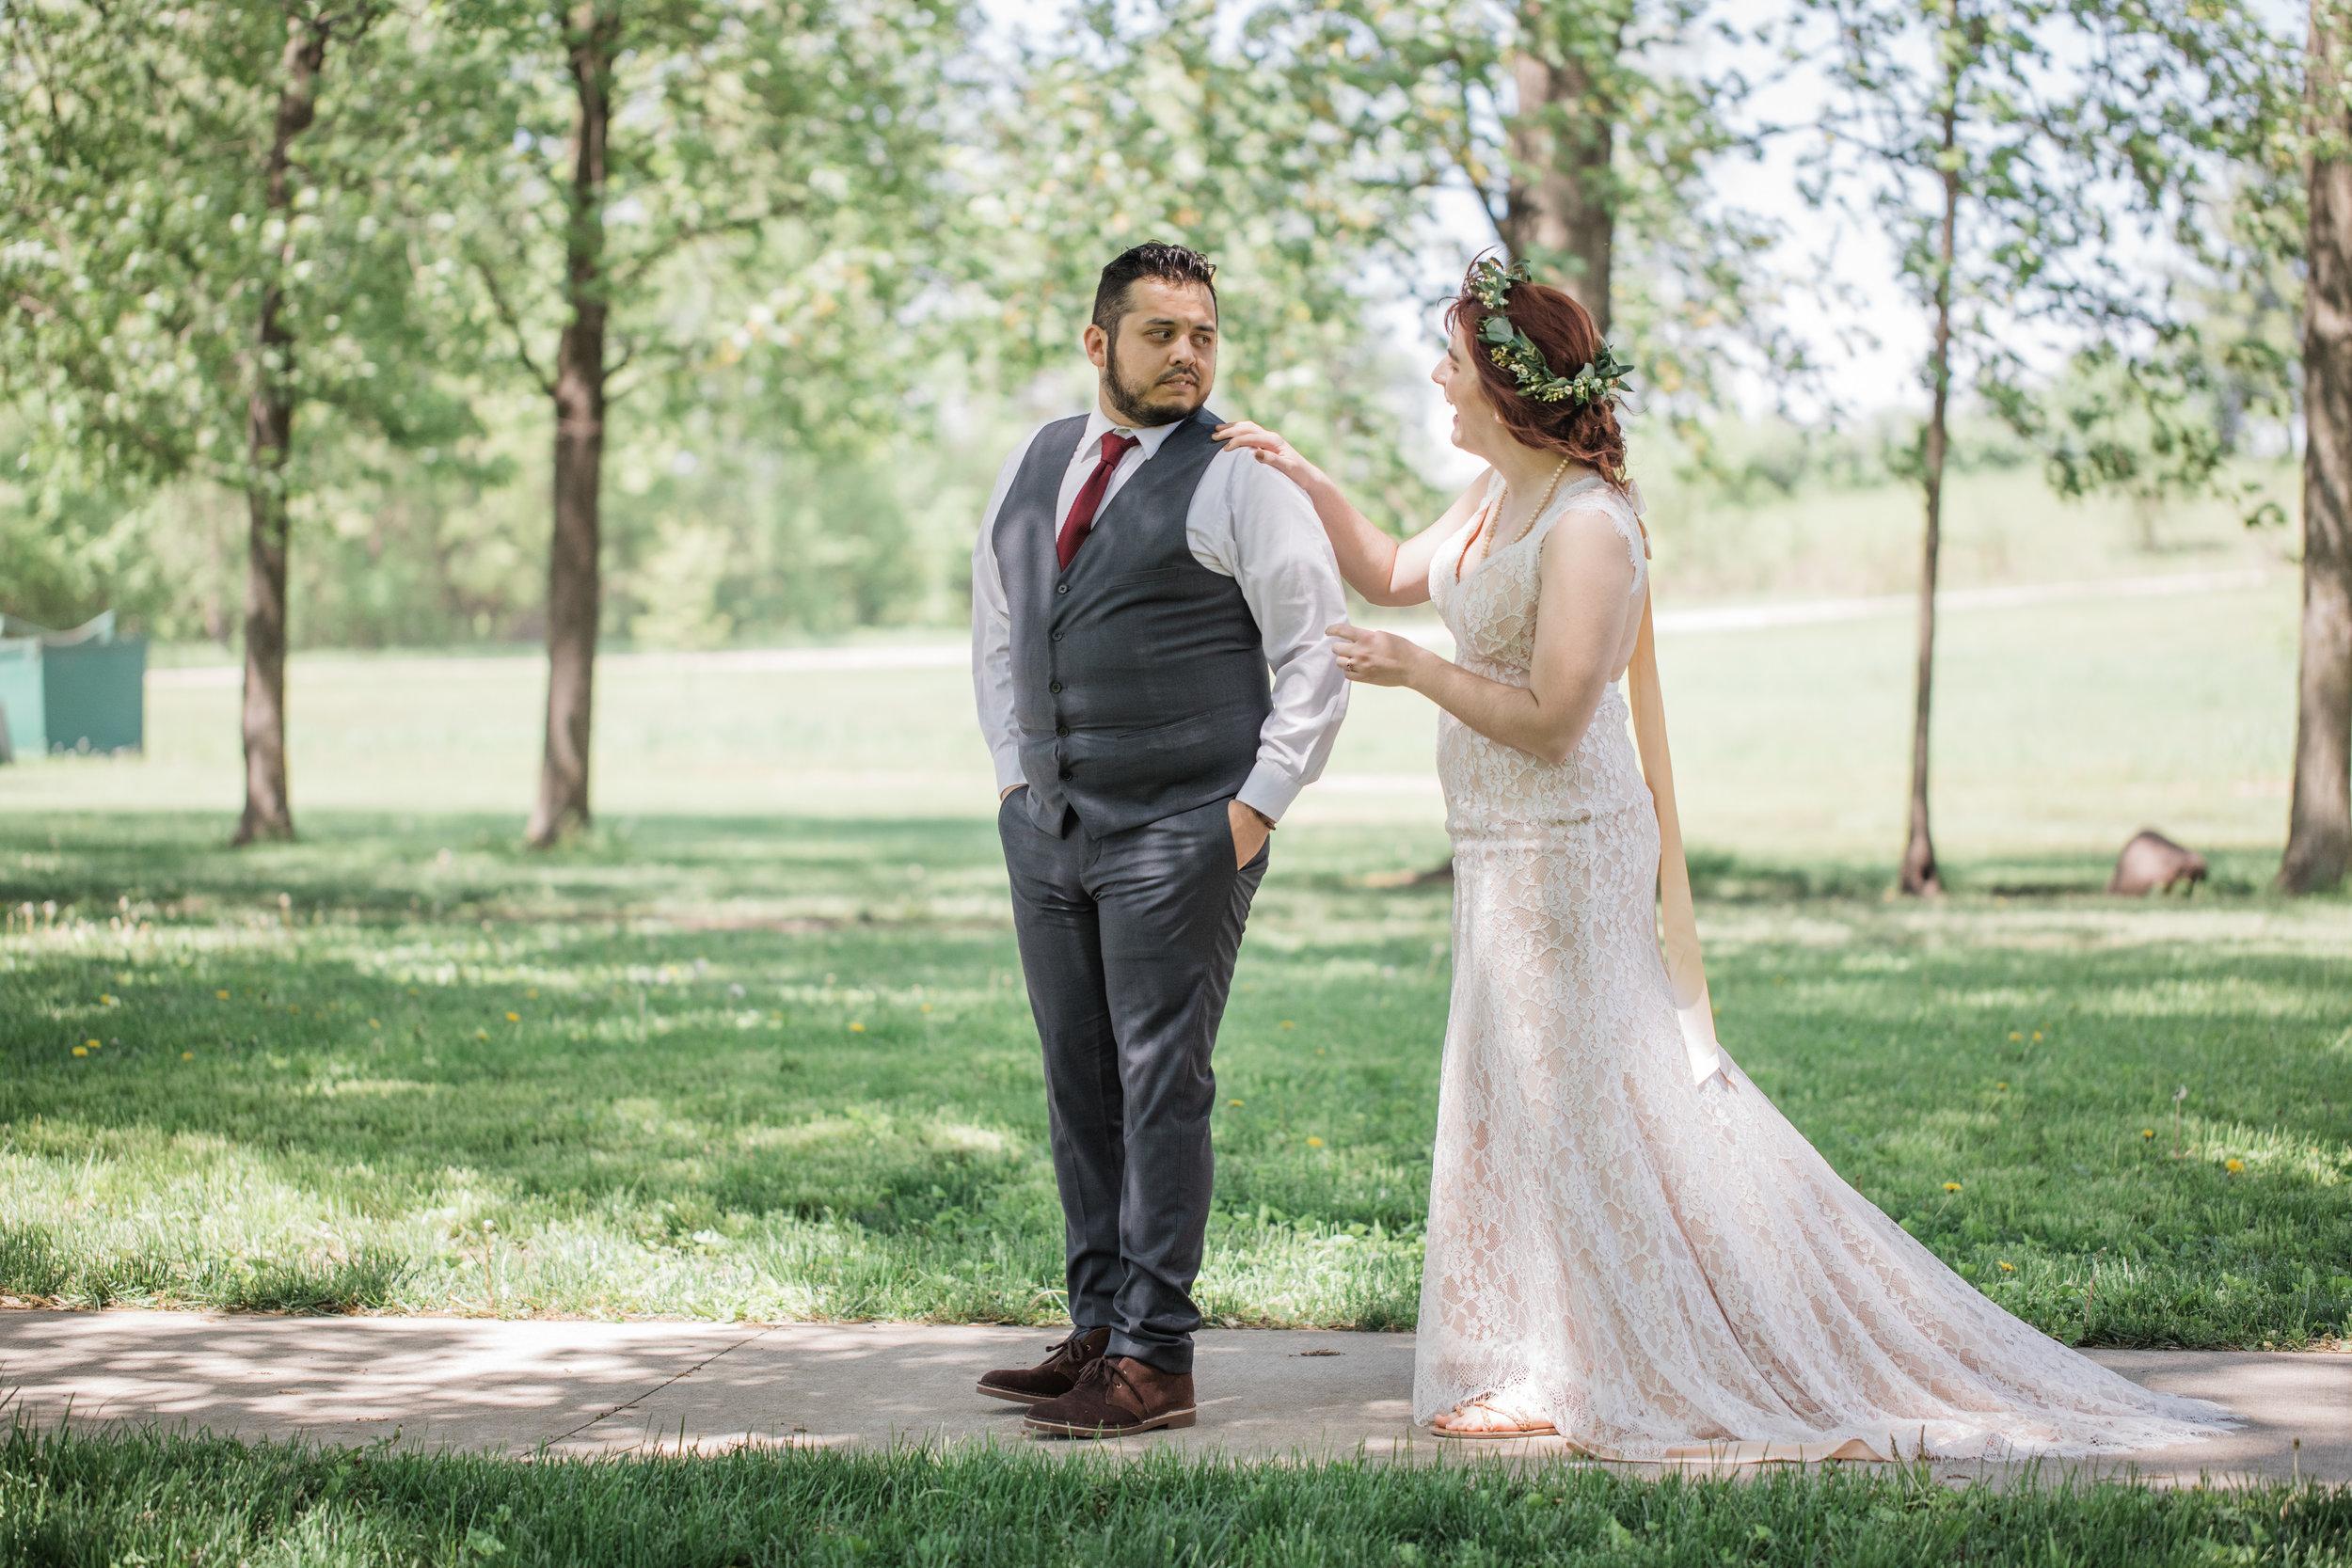 Morganne-Bobby-wedding-115.jpg